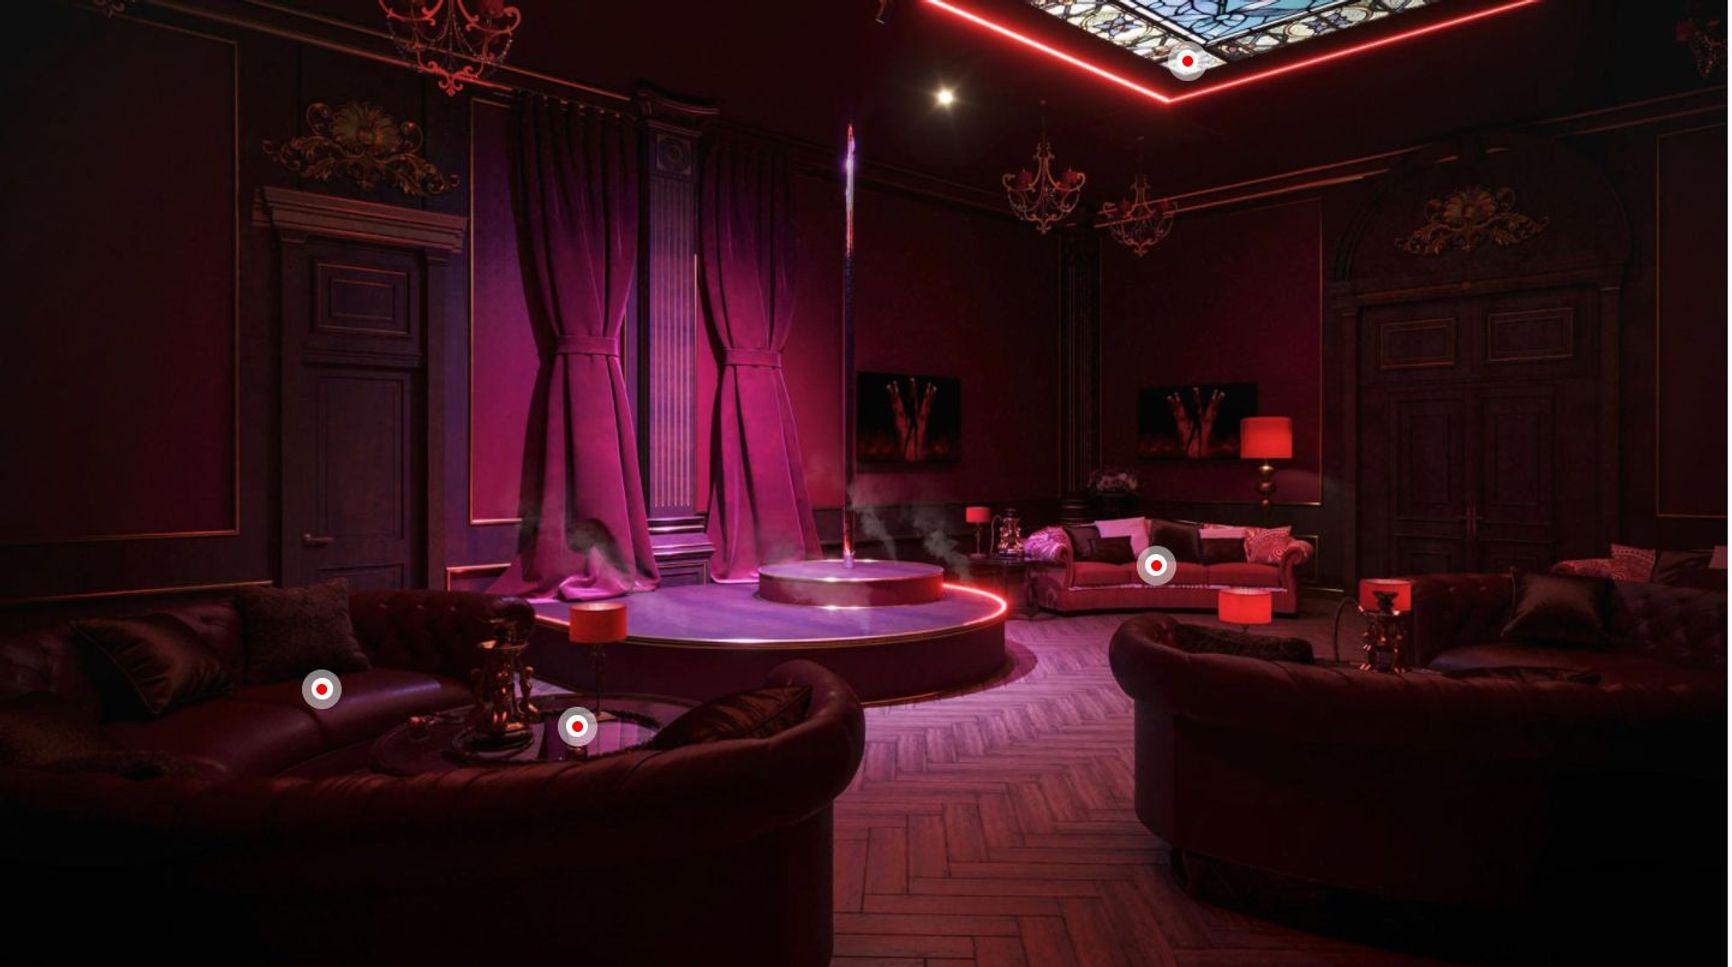 Кальянная комната с шестом во дворце Путина